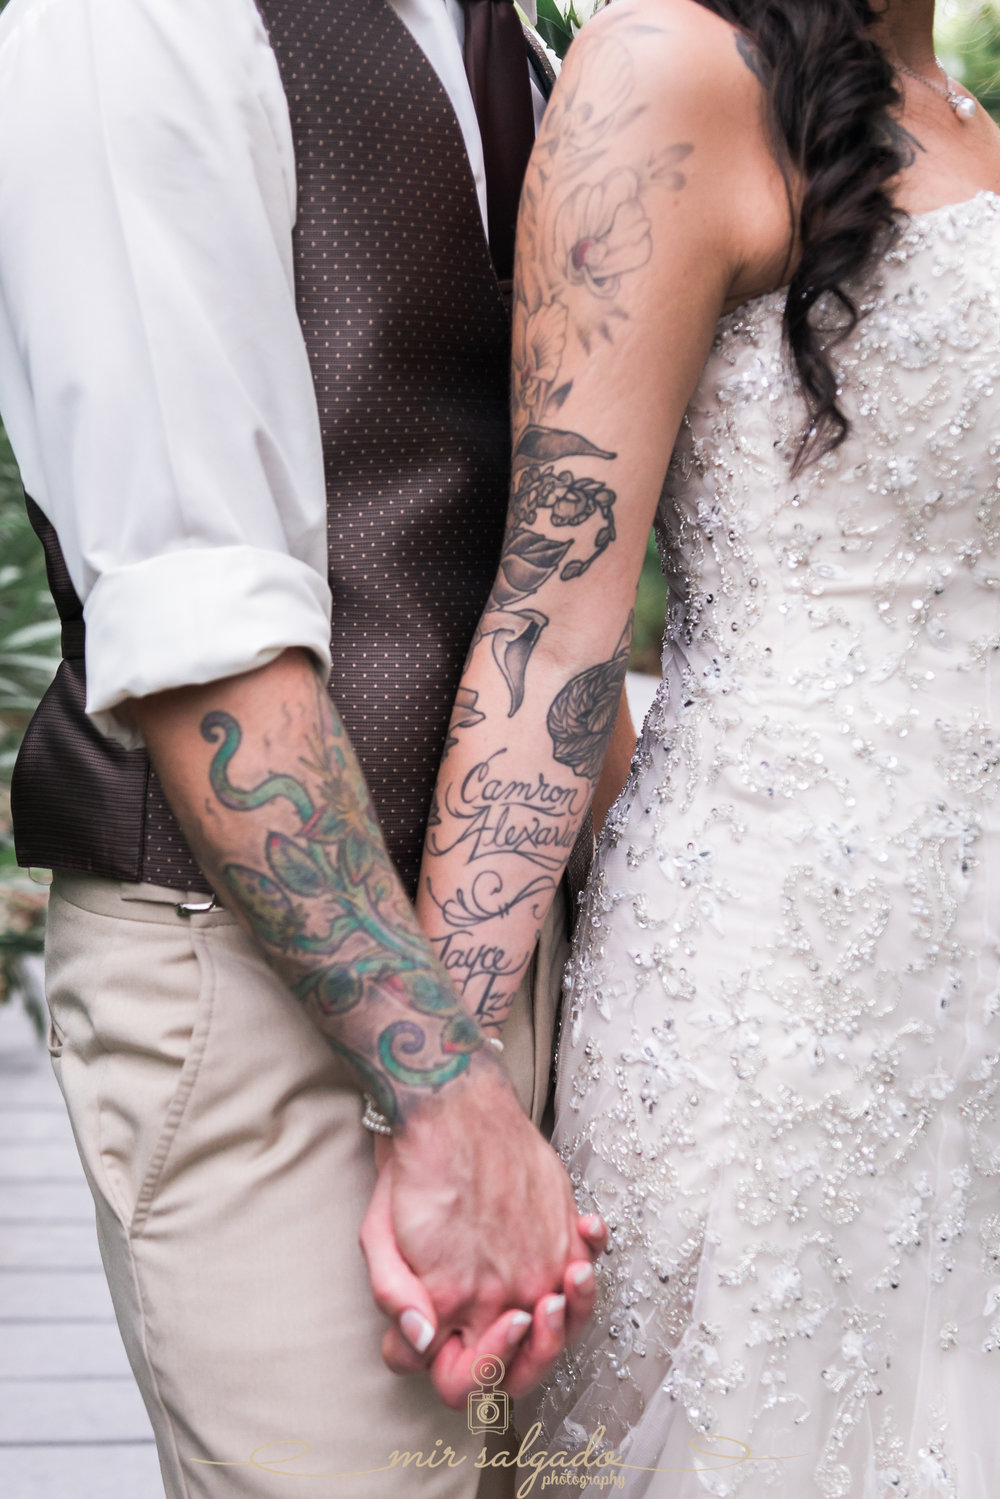 Florida-wedding-photo, bride-and-groom-tatoos